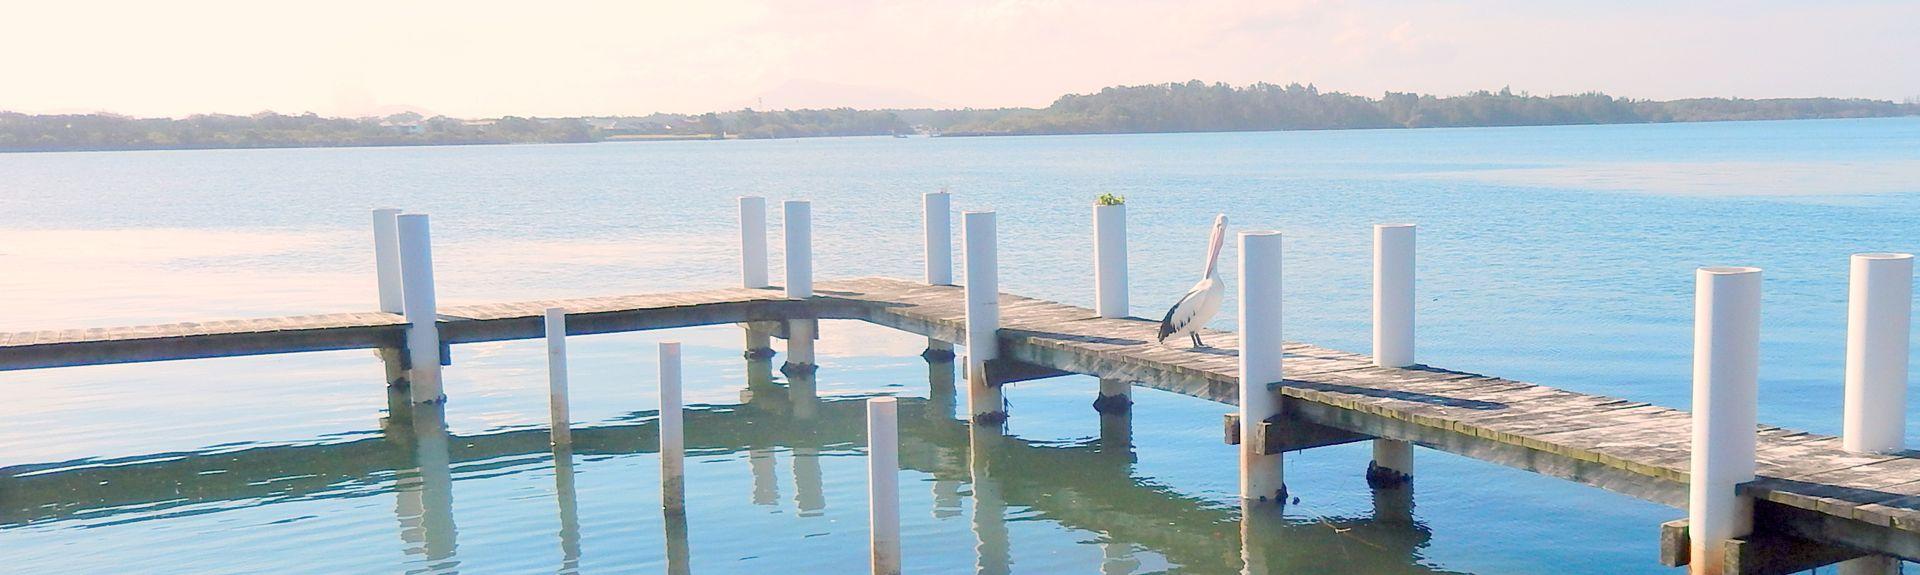 Diamond Beach, Diamond Beach, New South Wales, Australië